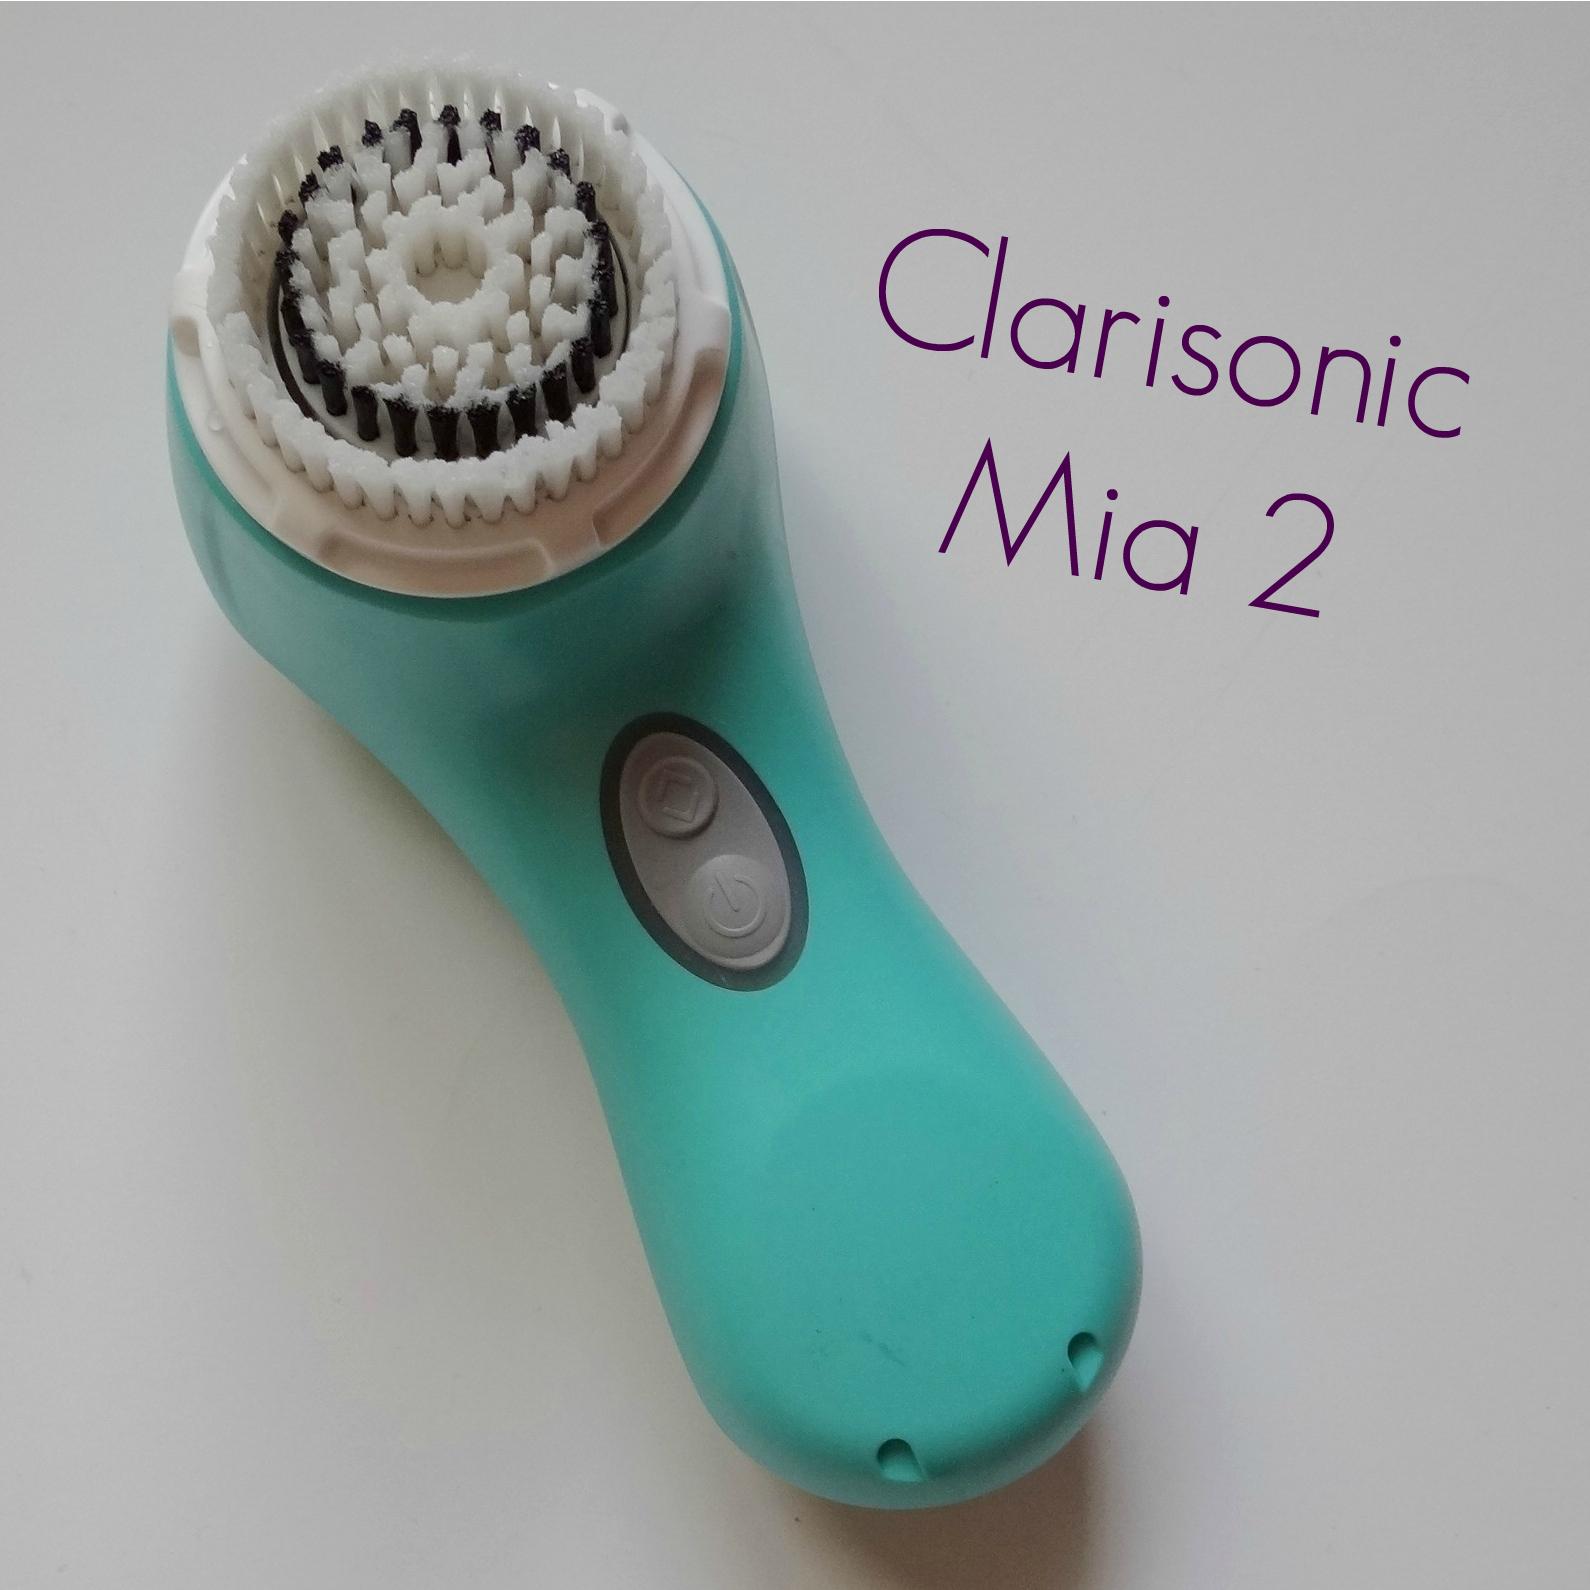 New Beauty Gadget Clarisonic Mia 2 Review Baby Shopaholic